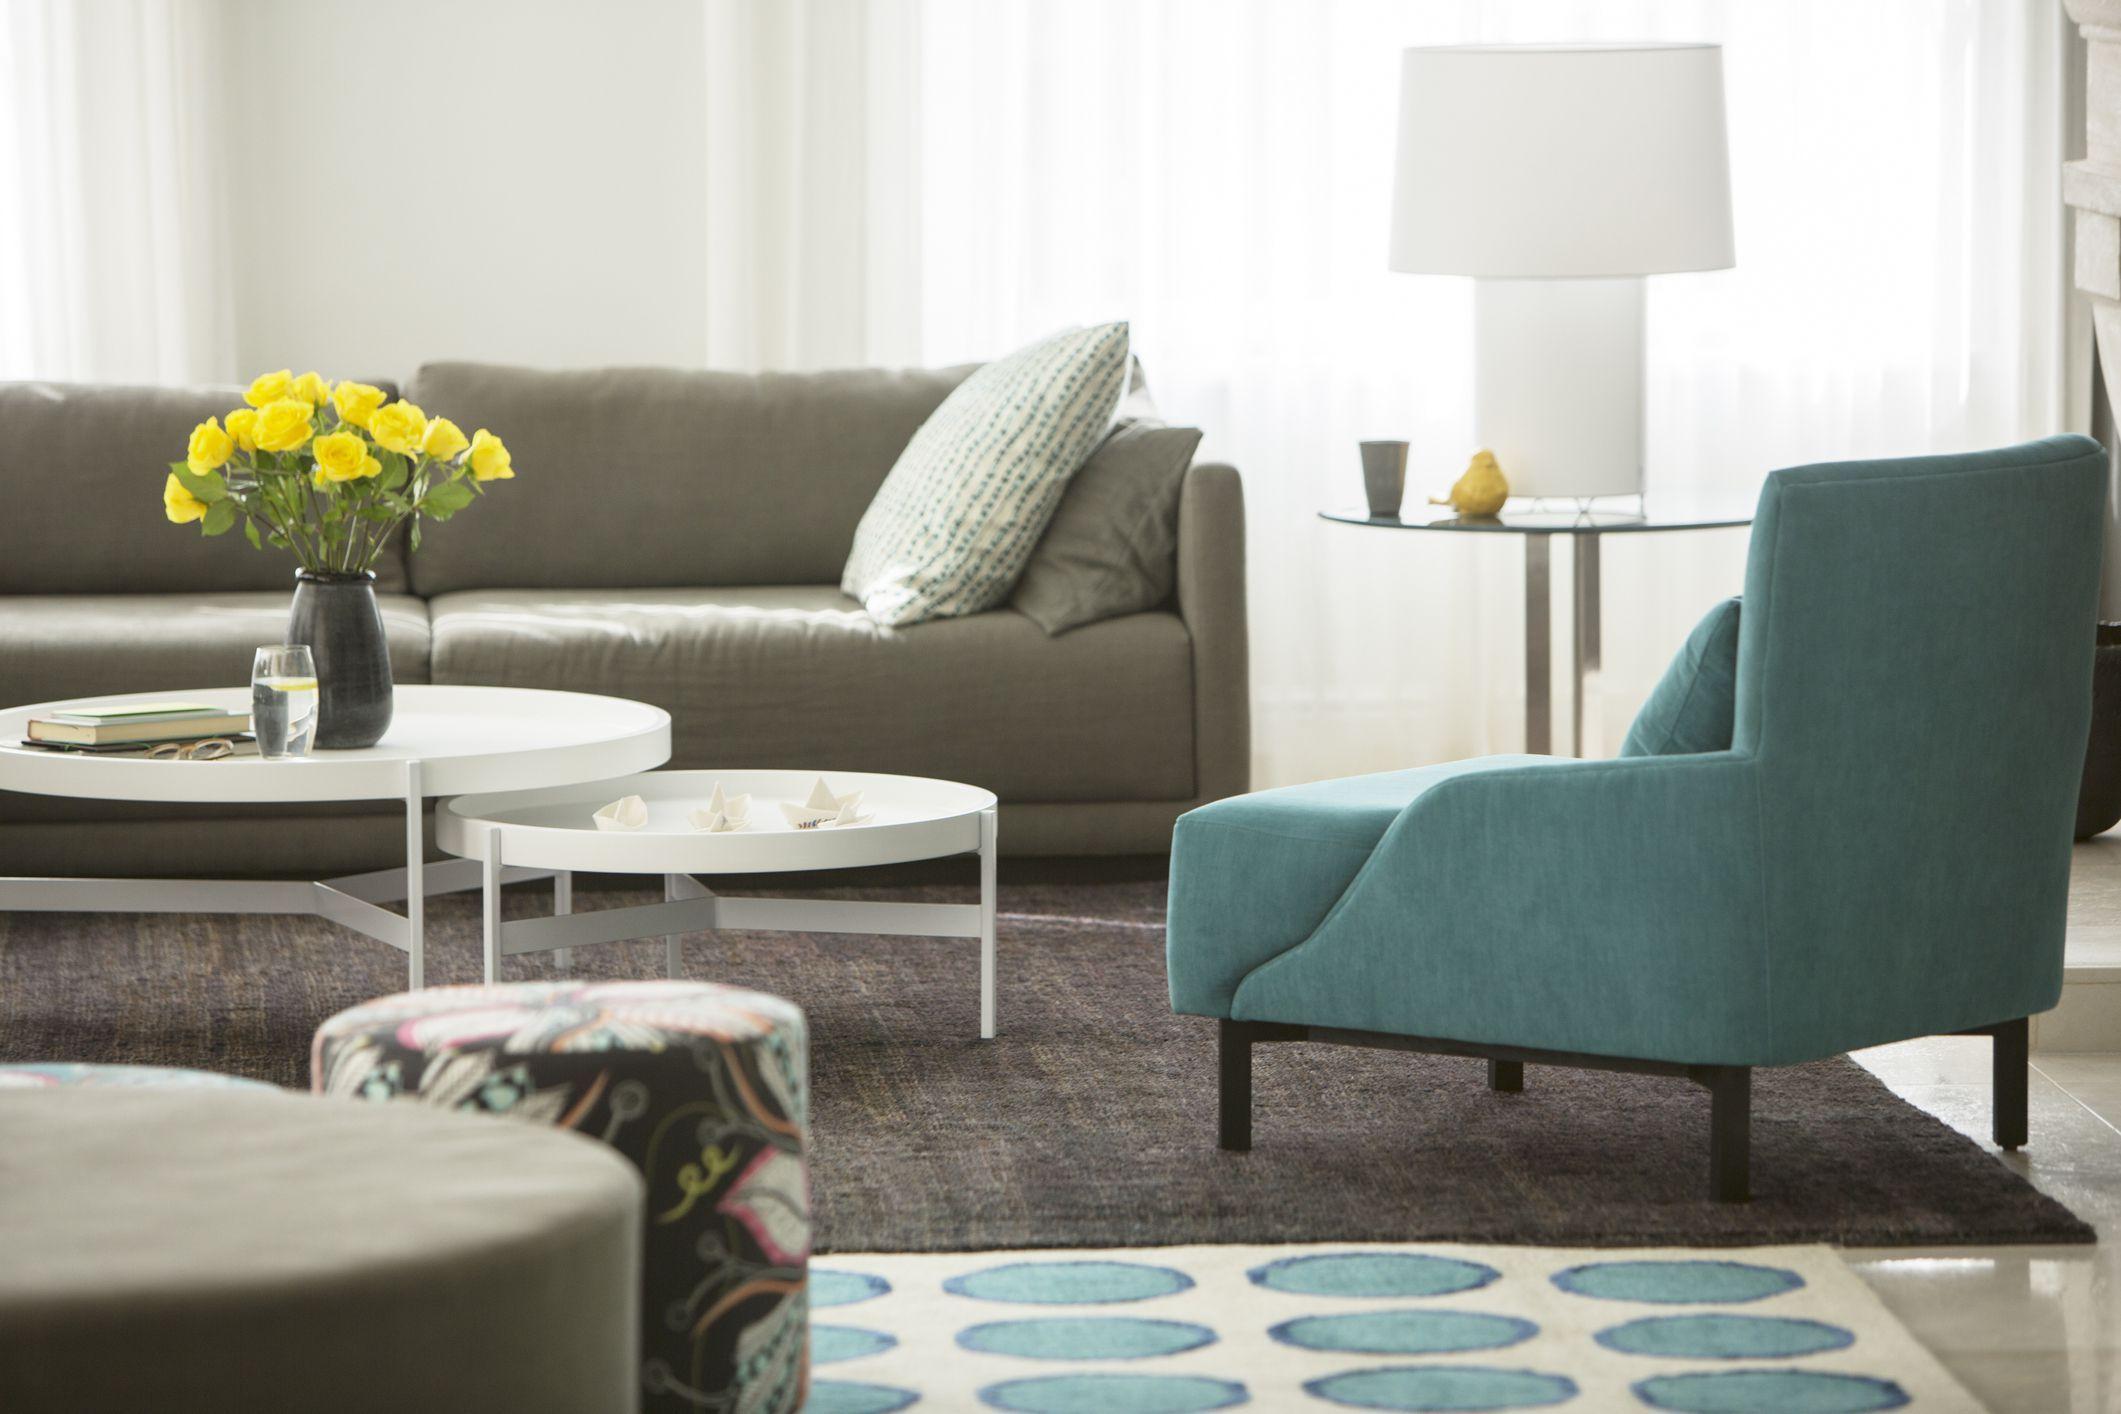 Interior Design Basics For Each Room Of Your House Small Room Design Interior Design Basics Furniture Design Living Room